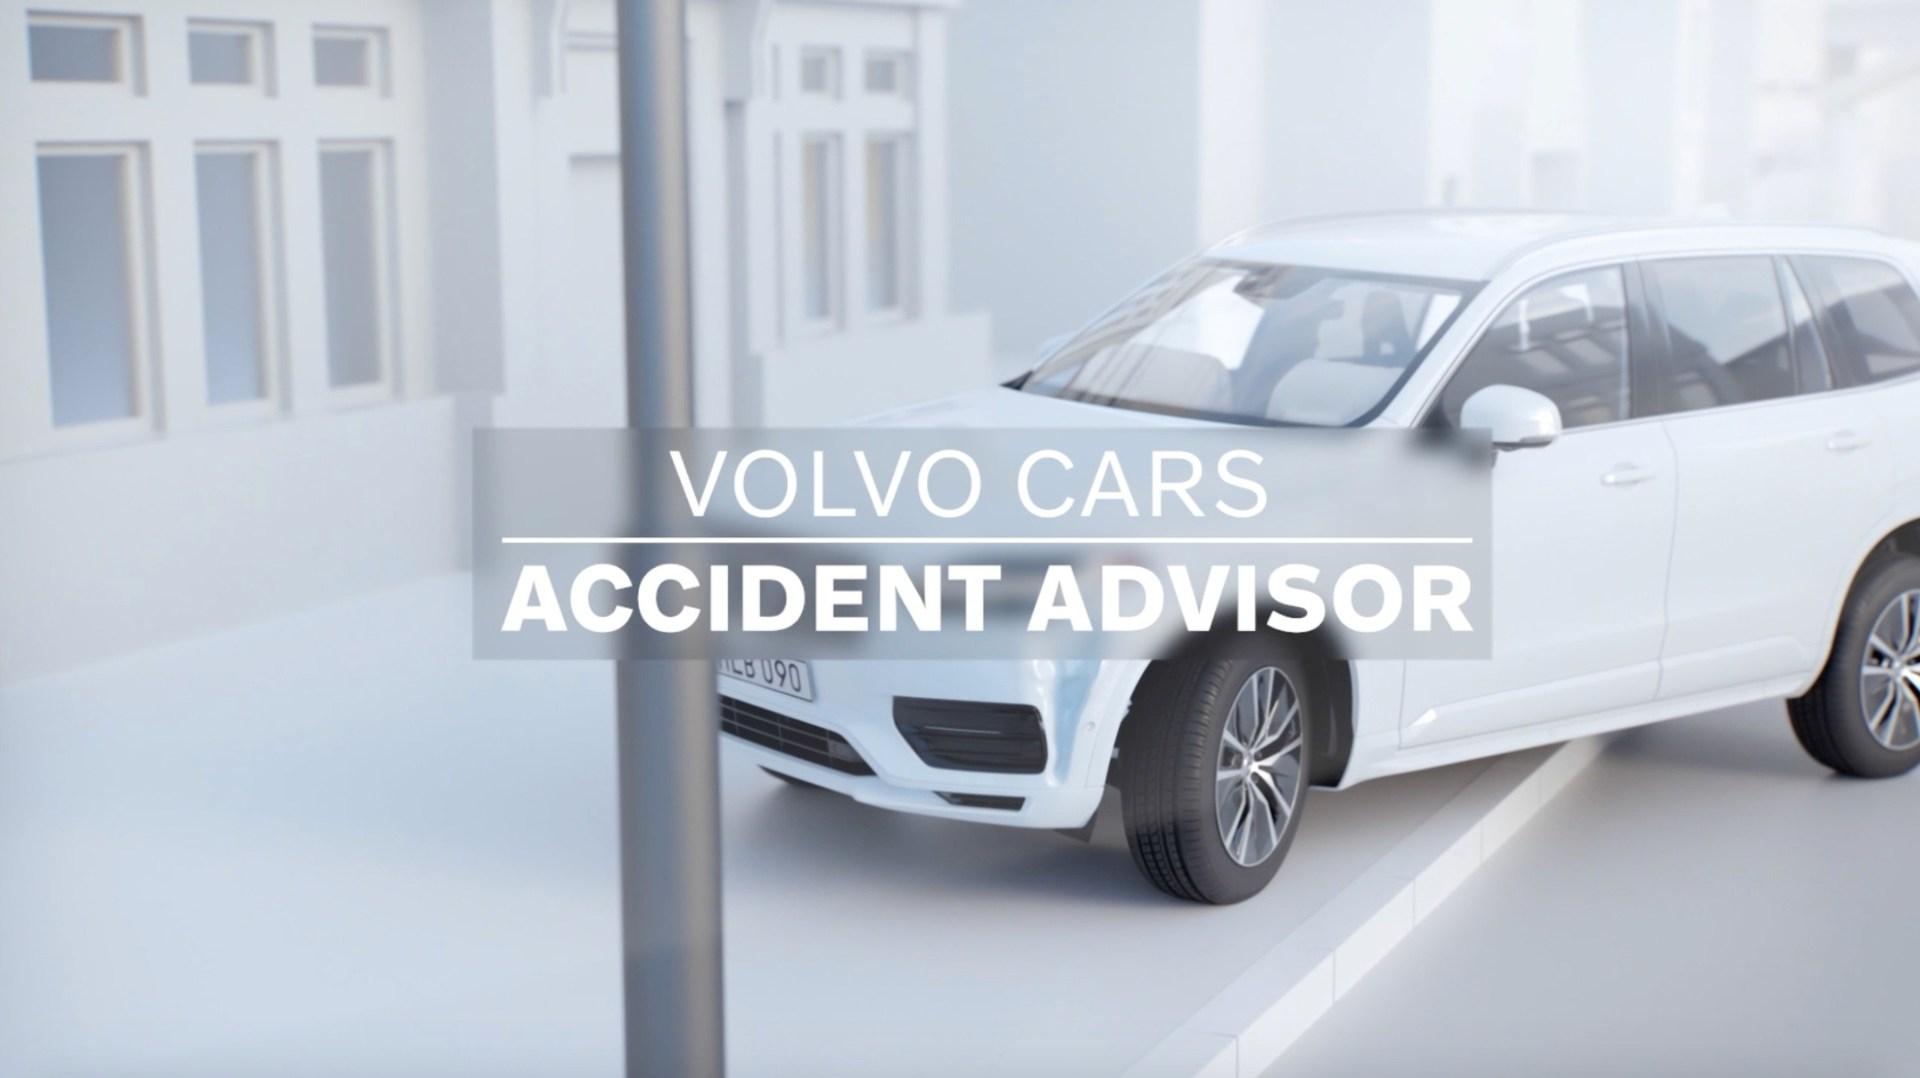 Volvo Car Accident Advisor